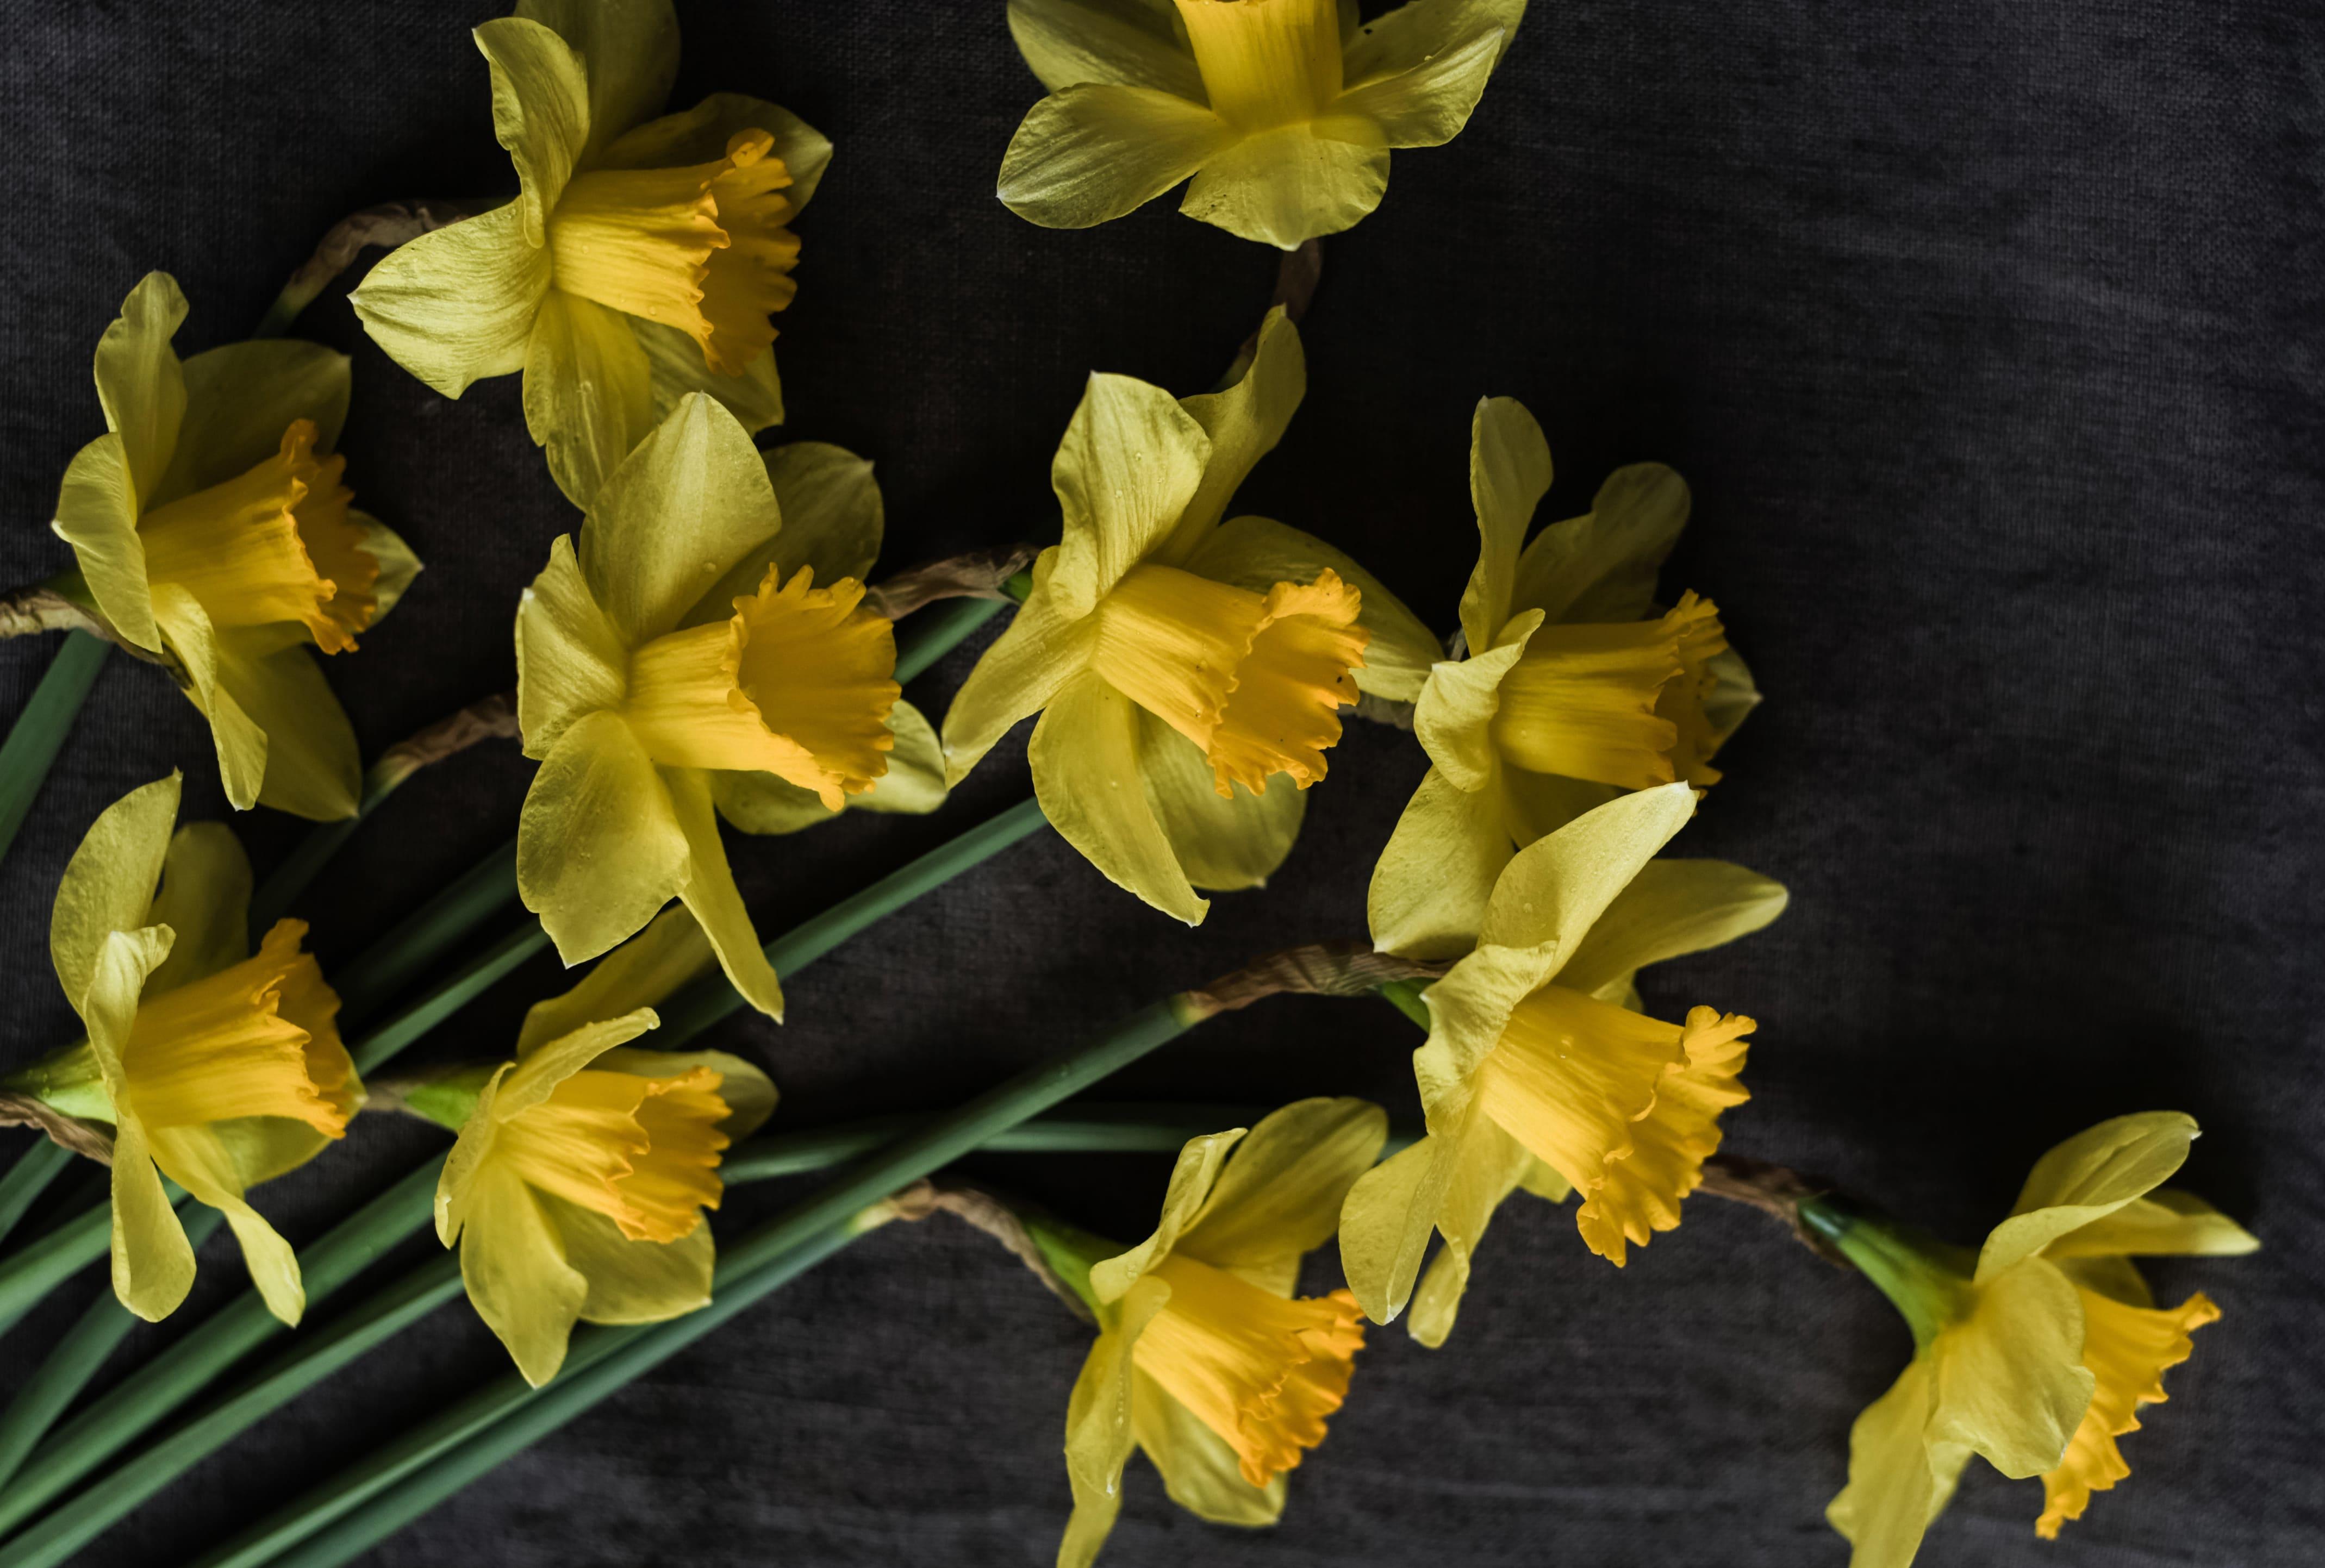 daffodils-photo-41